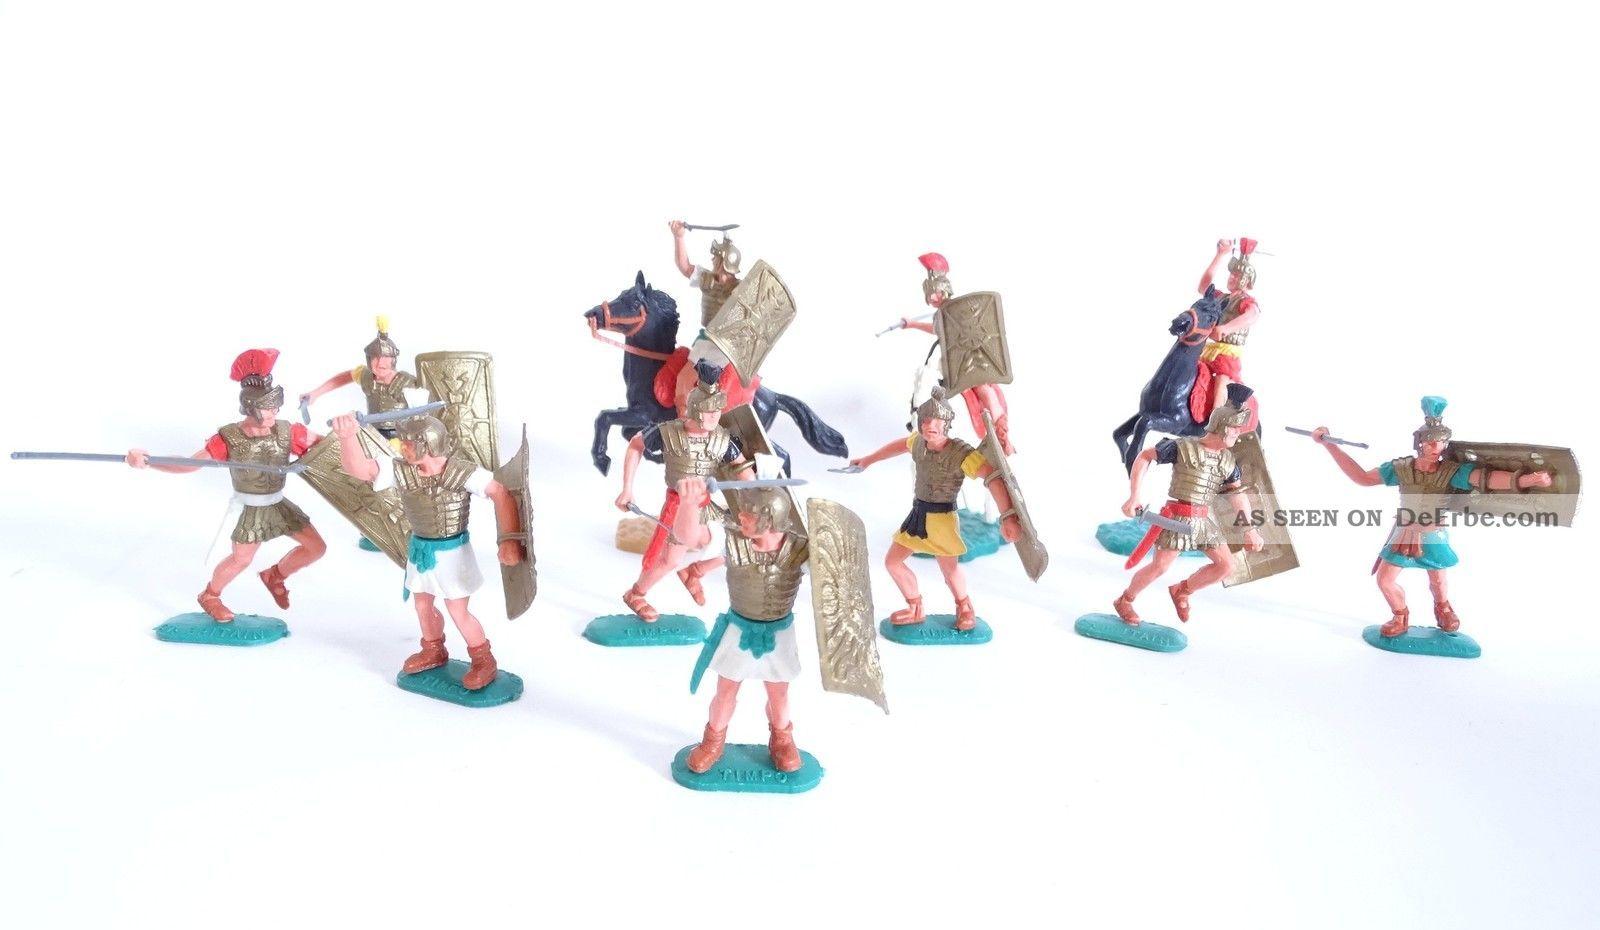 Großes Konvolut Timpo Toys Römer Krieger Raritäten Seltene Varianten Gefertigt nach 1945 Bild